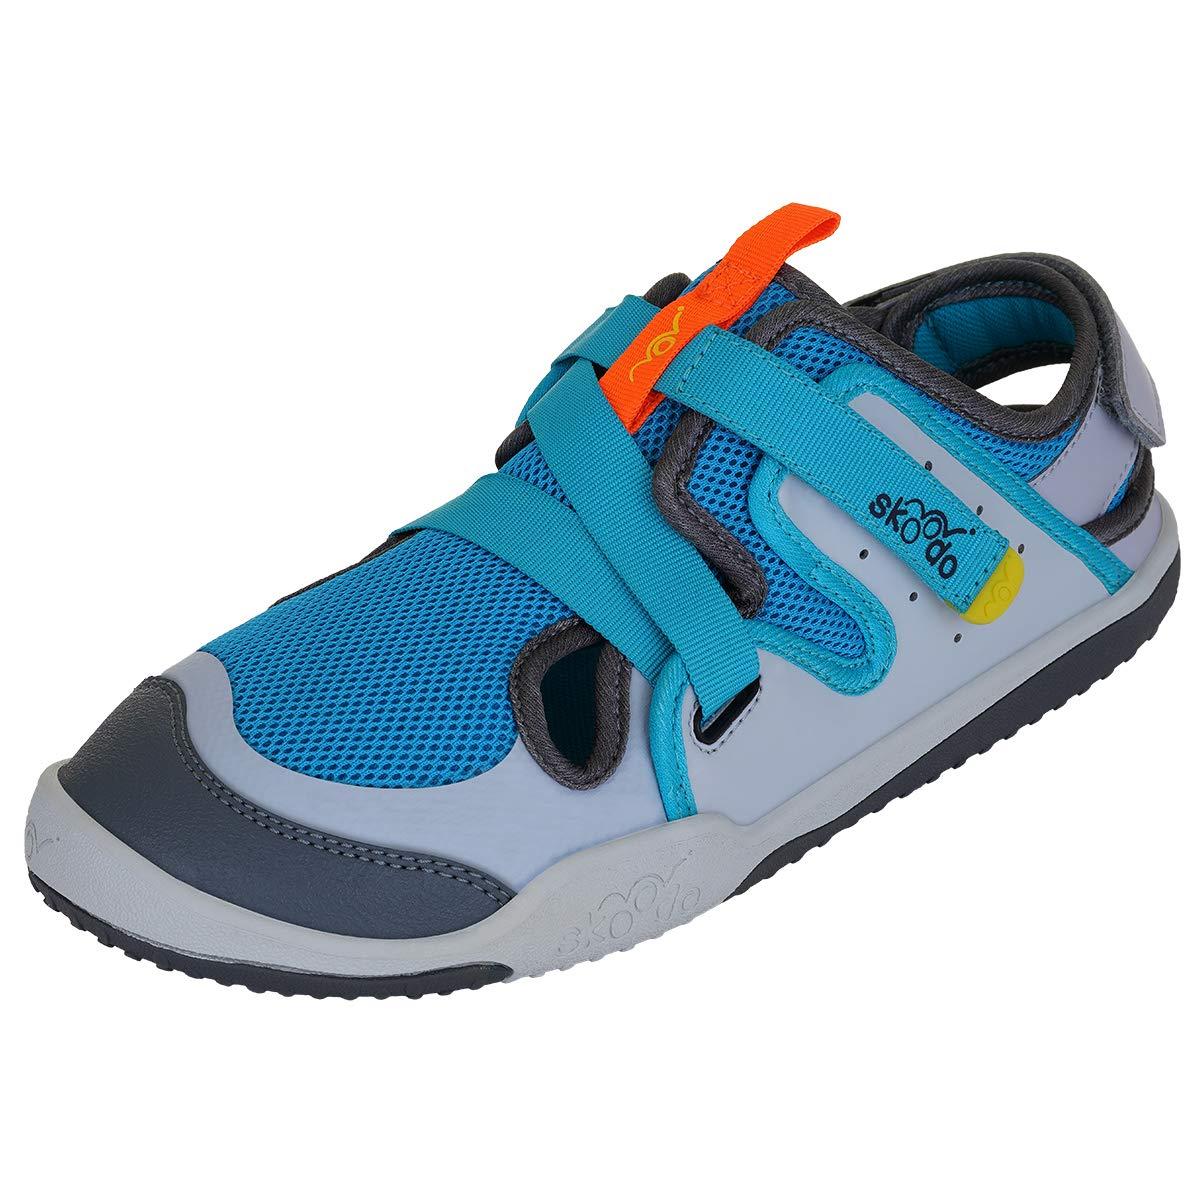 Buy Skoodo Unisex-Child Sports Shoes at